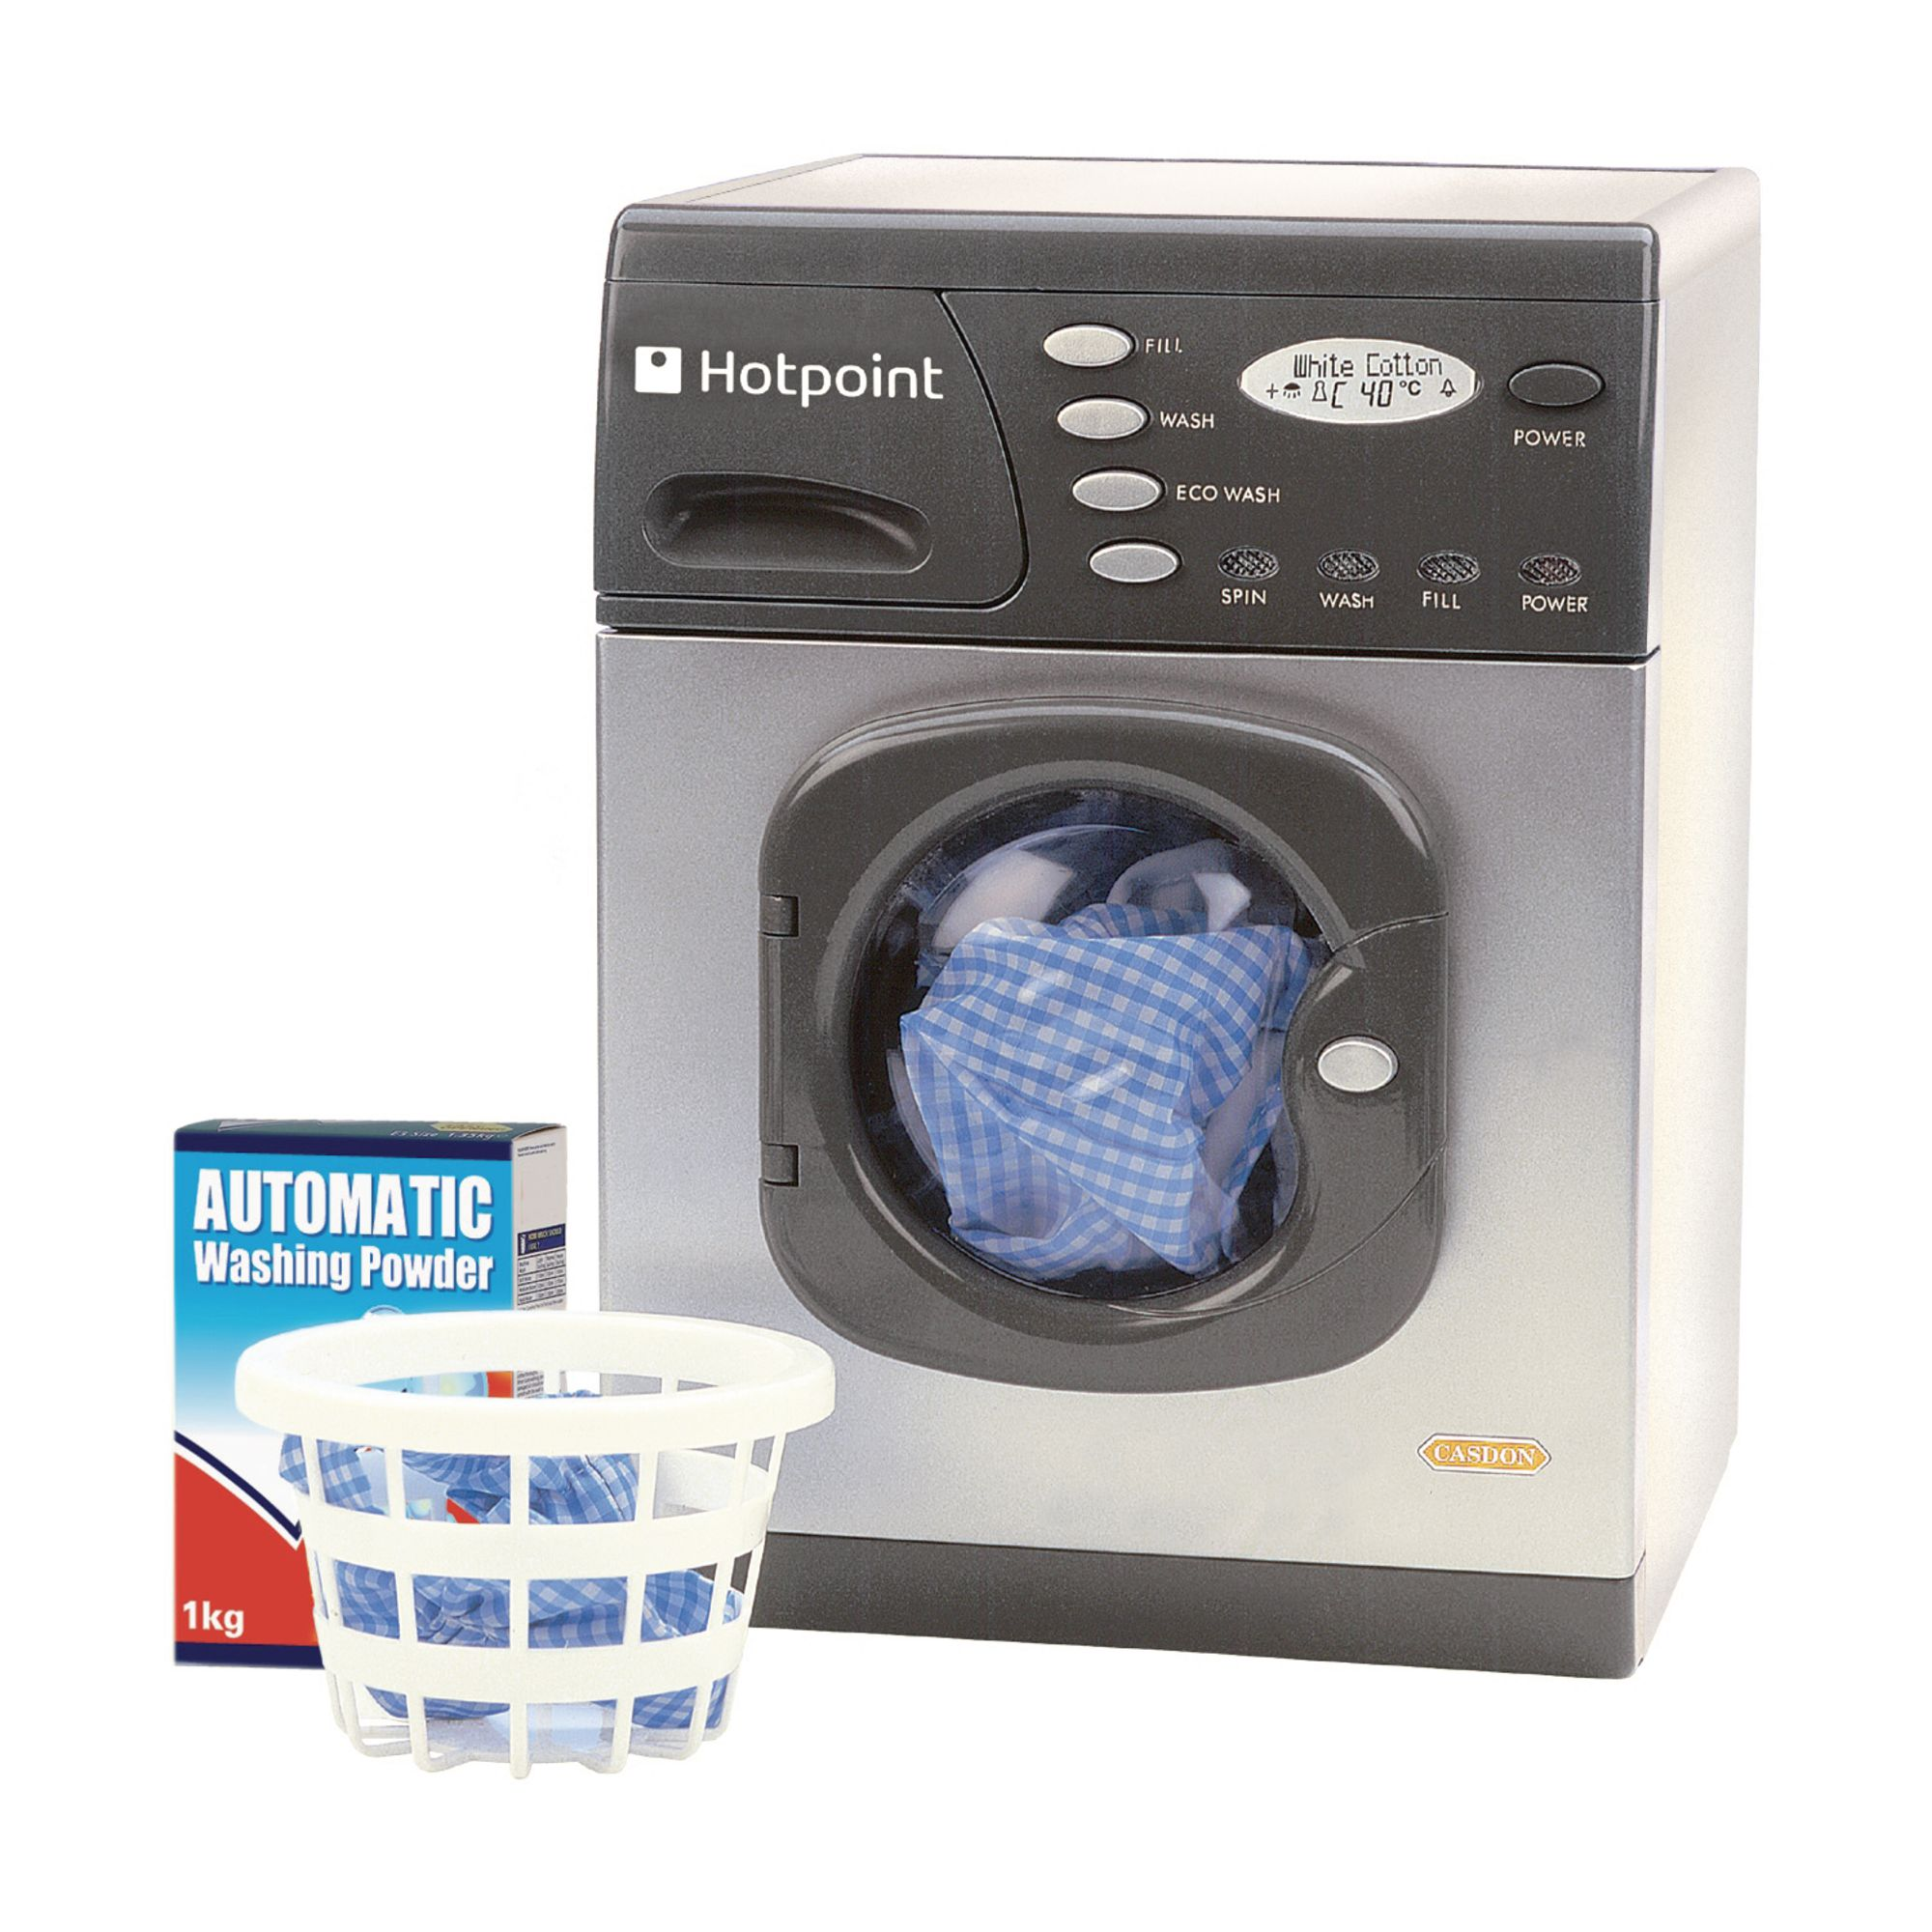 Hotpoint Washing Machine - HE1001650 | Hope Education on Washing Machine  id=69983